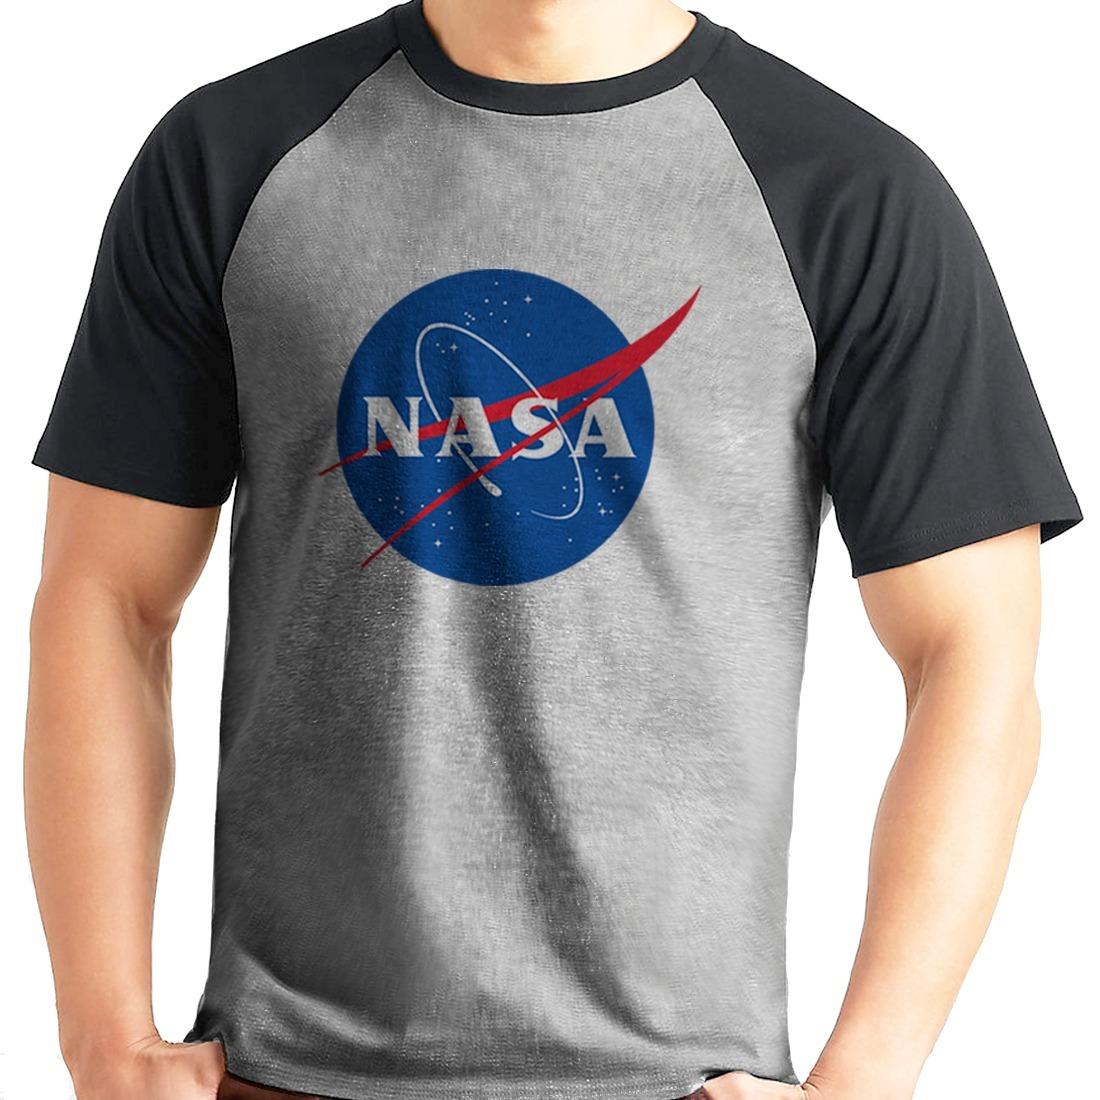 a03ba83d5 camiseta nasa geek nerd cosplay raglan mescla curta. Carregando zoom.